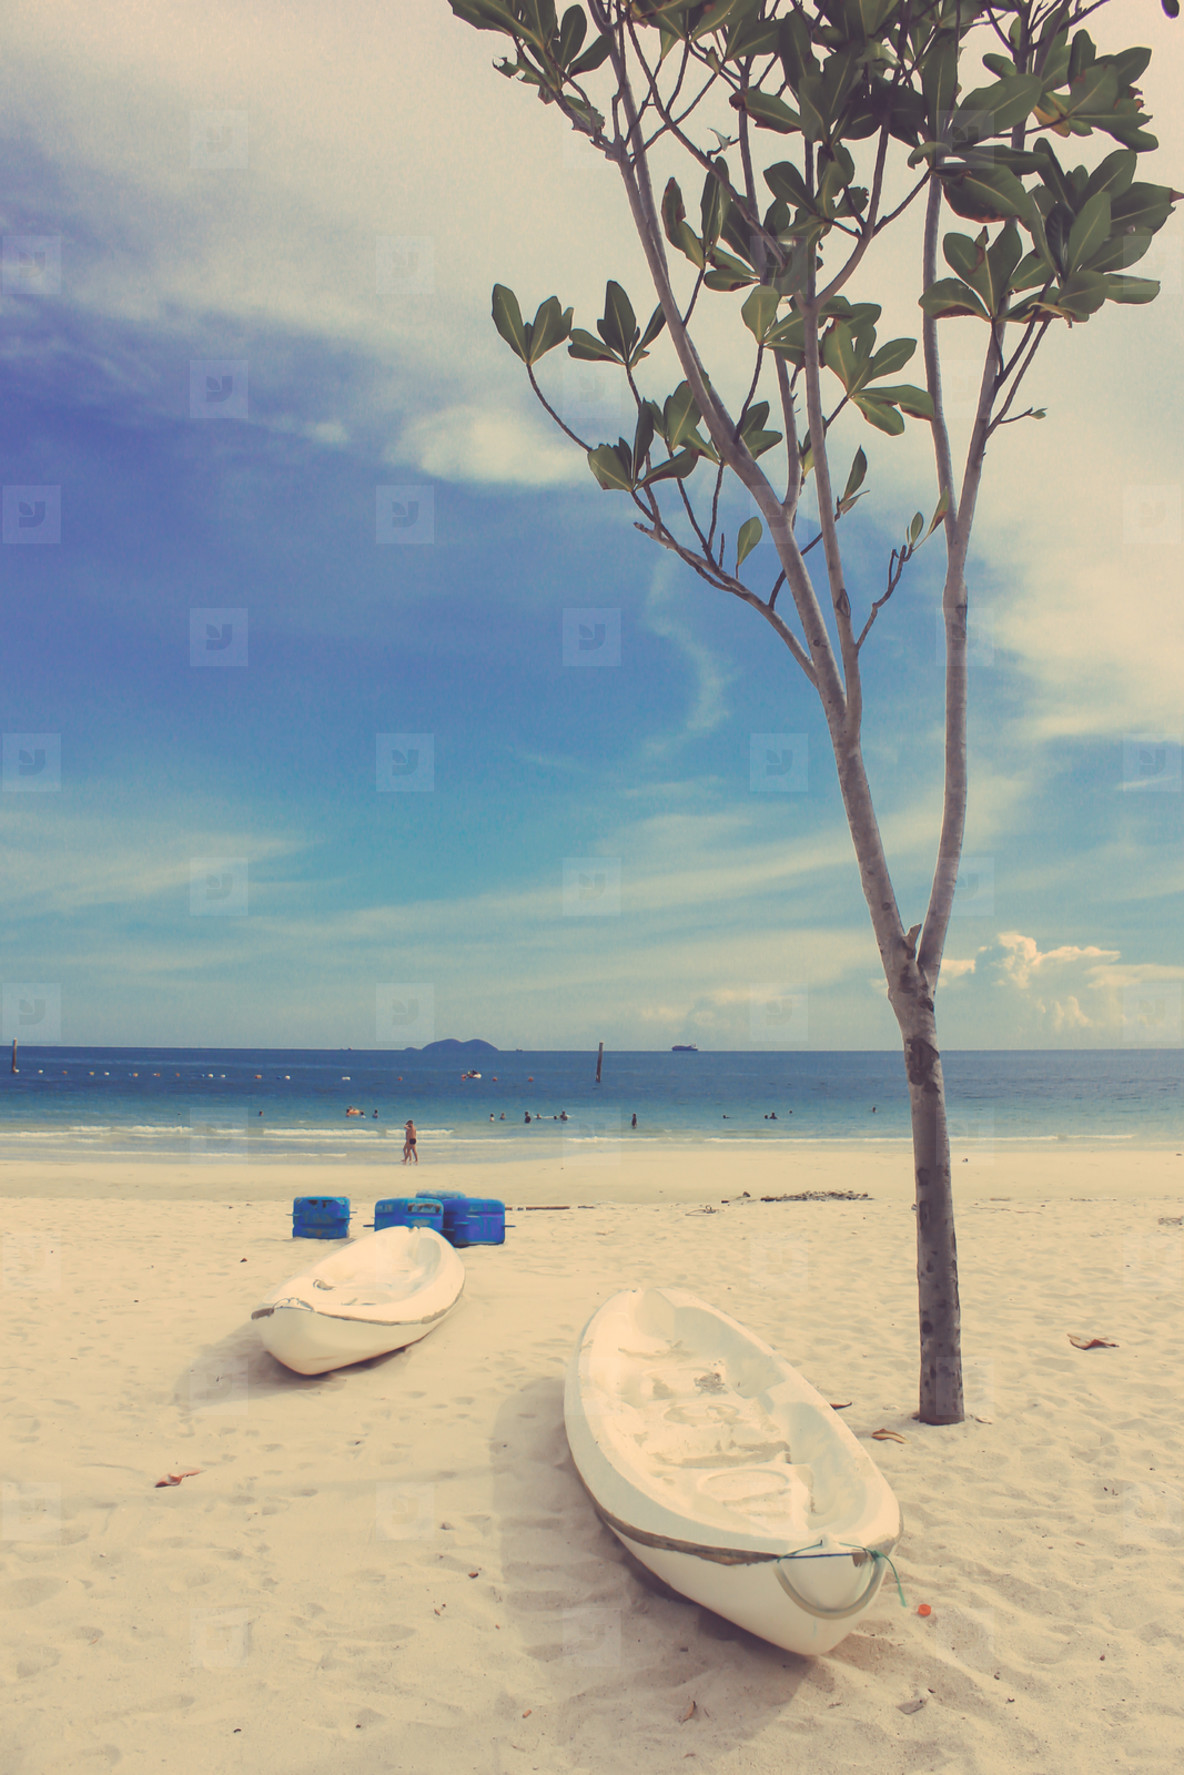 Tree and kayaks on the beach